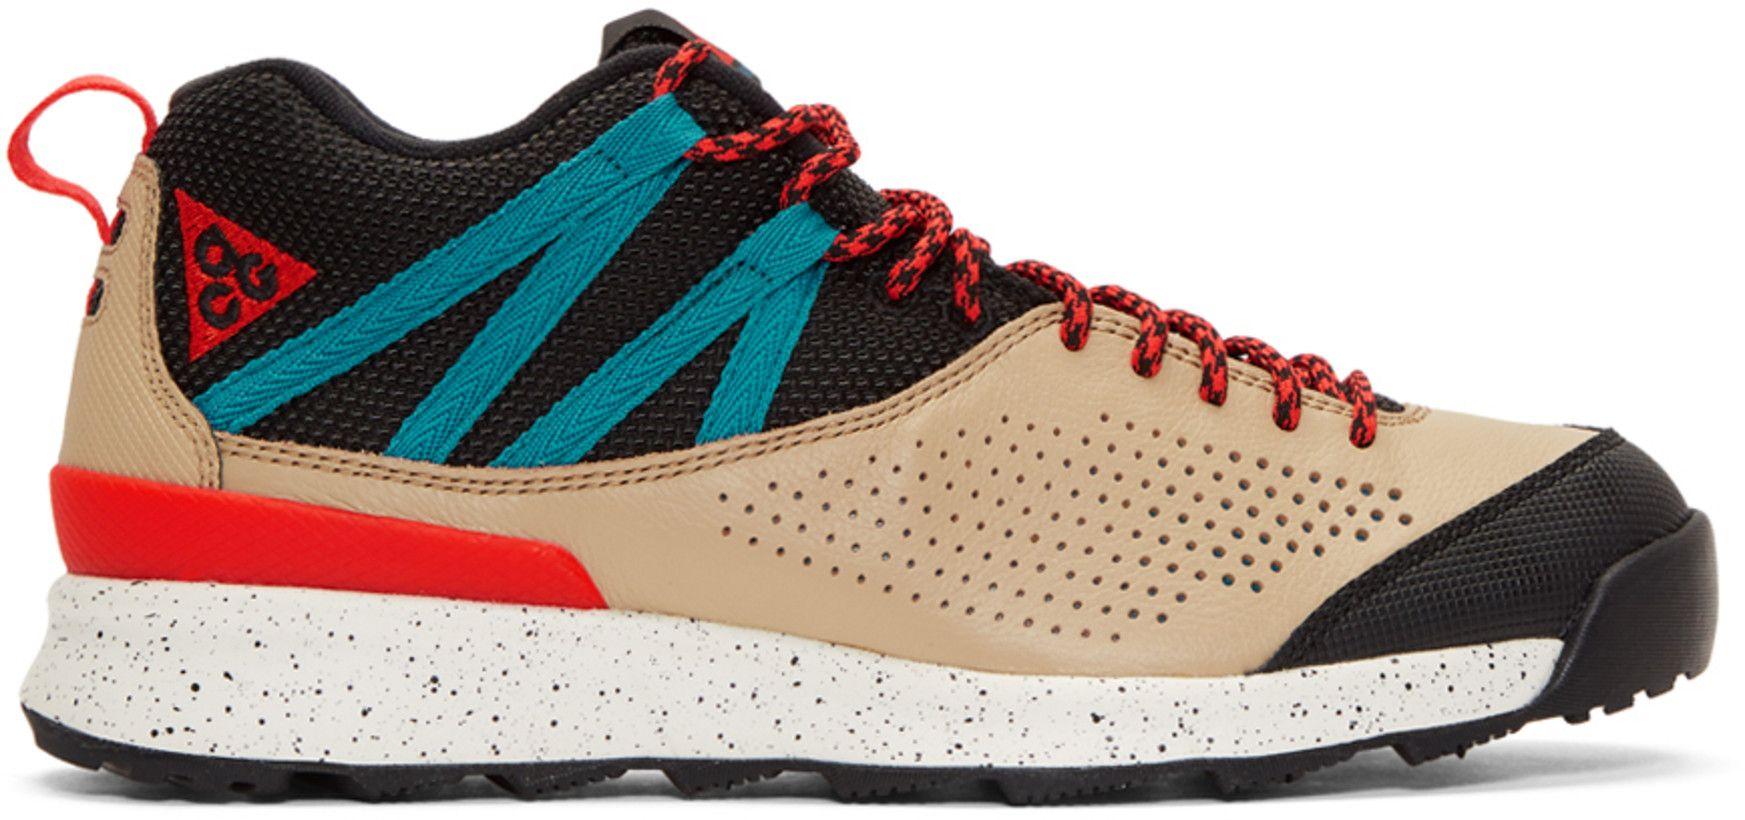 Nike ACG - Beige   Red Okwahn II Sneakers  09e922a61